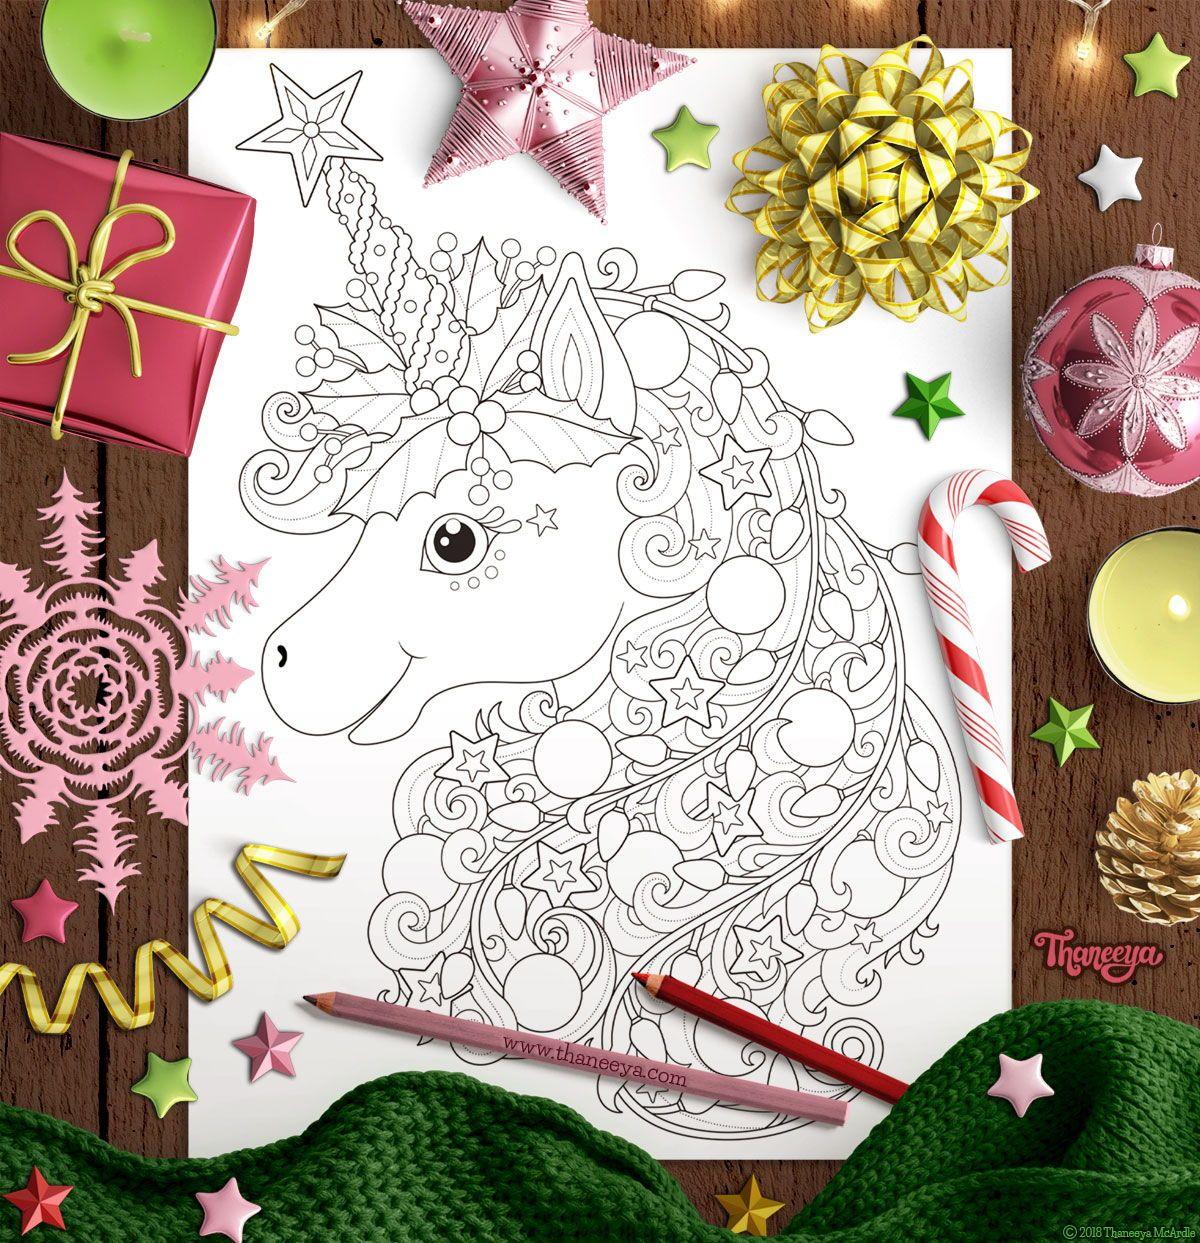 Christmas Unicorn coloring page from Thaneeya McArdle\u0027s